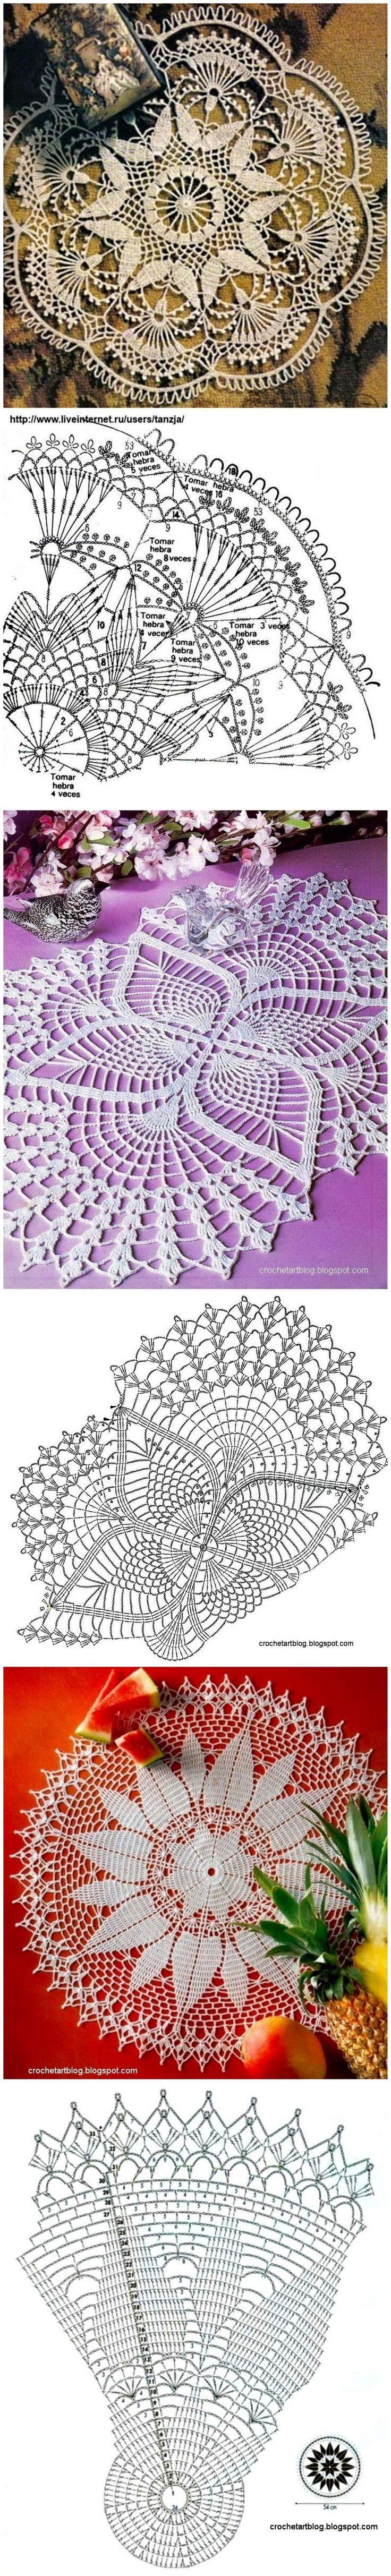 Lots & lots & ....  Lots of free crochet doily patterns here.: